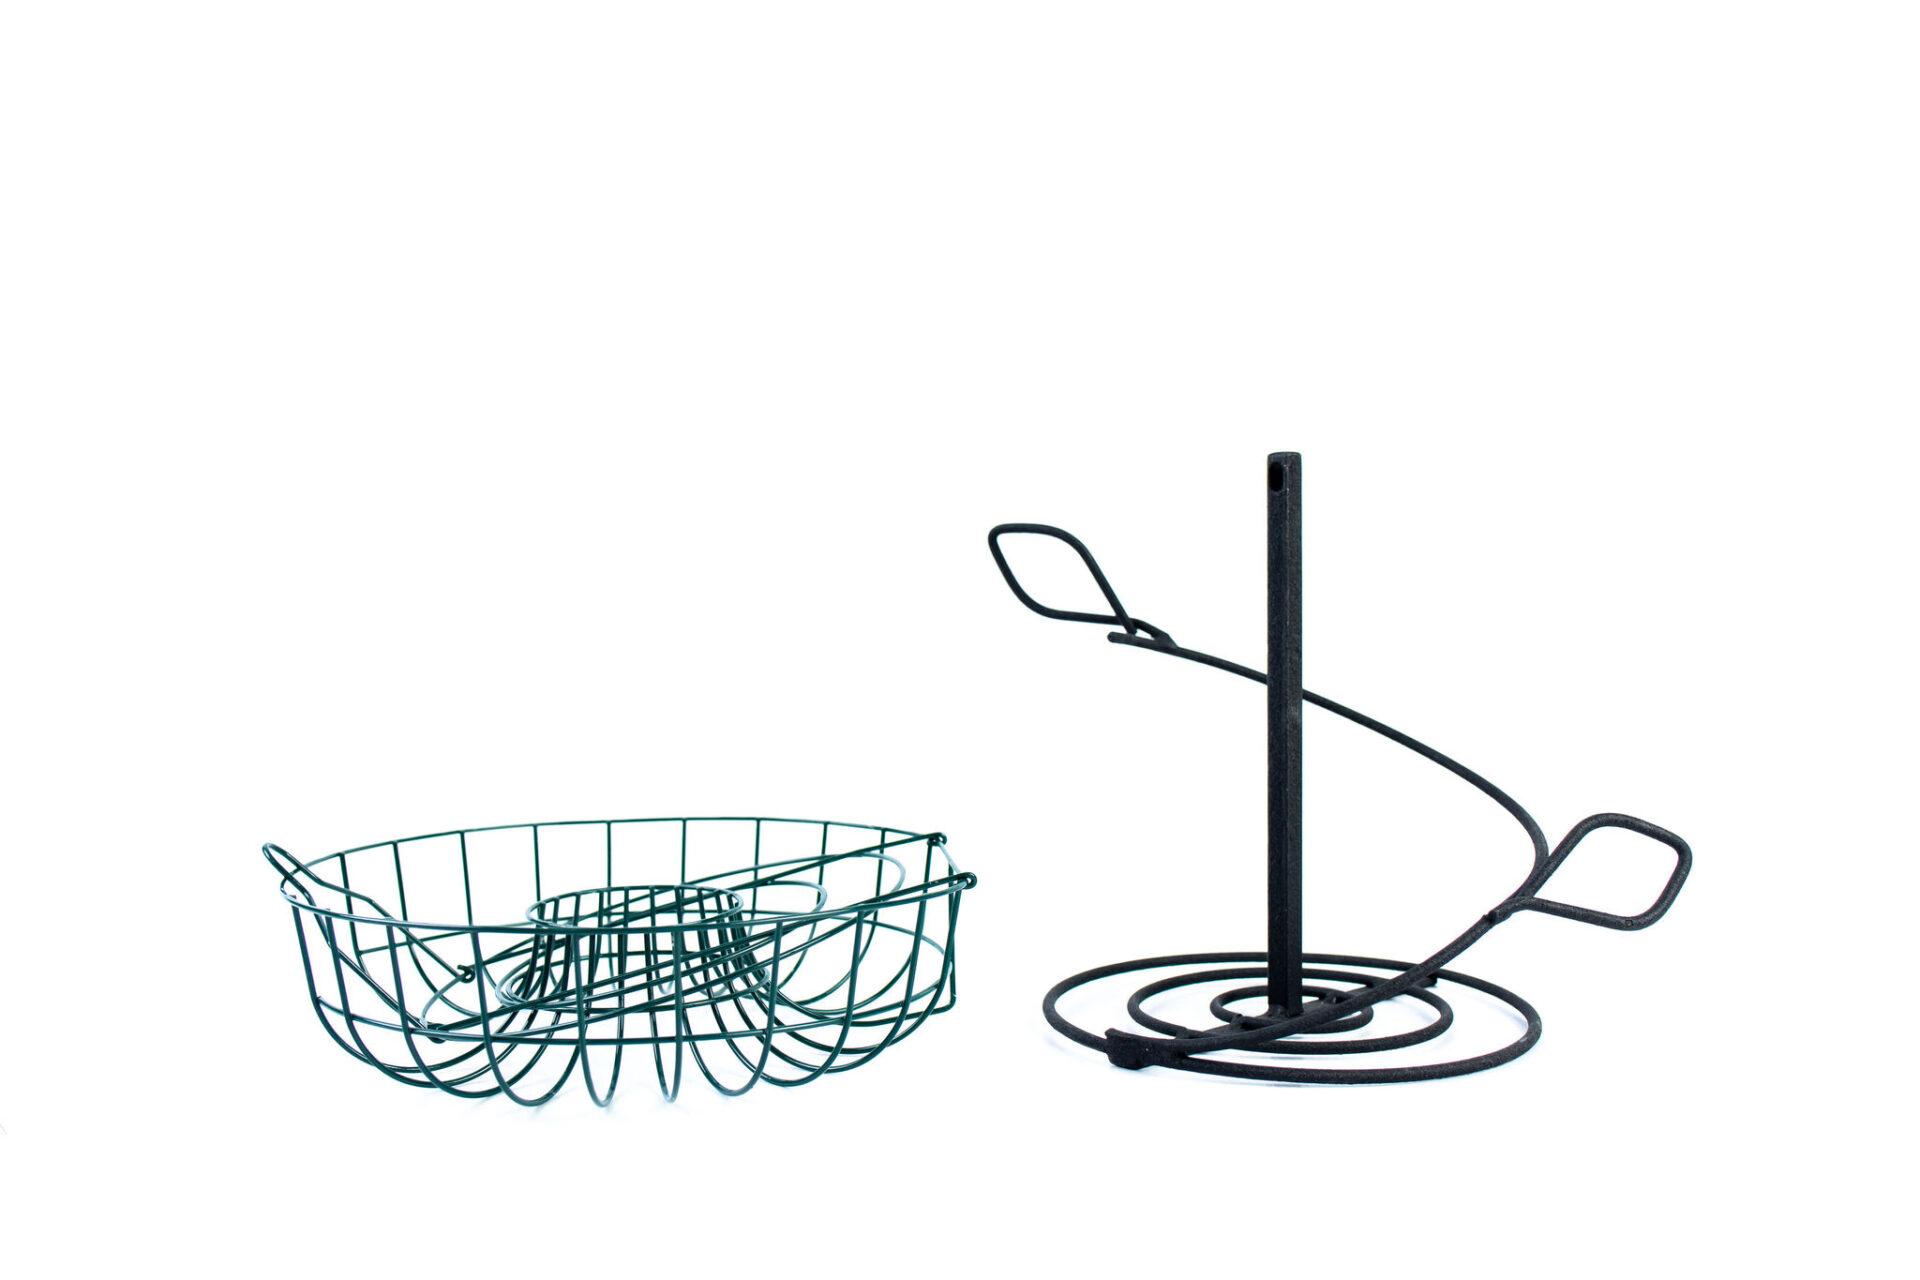 green metal wire basket and black metal parts